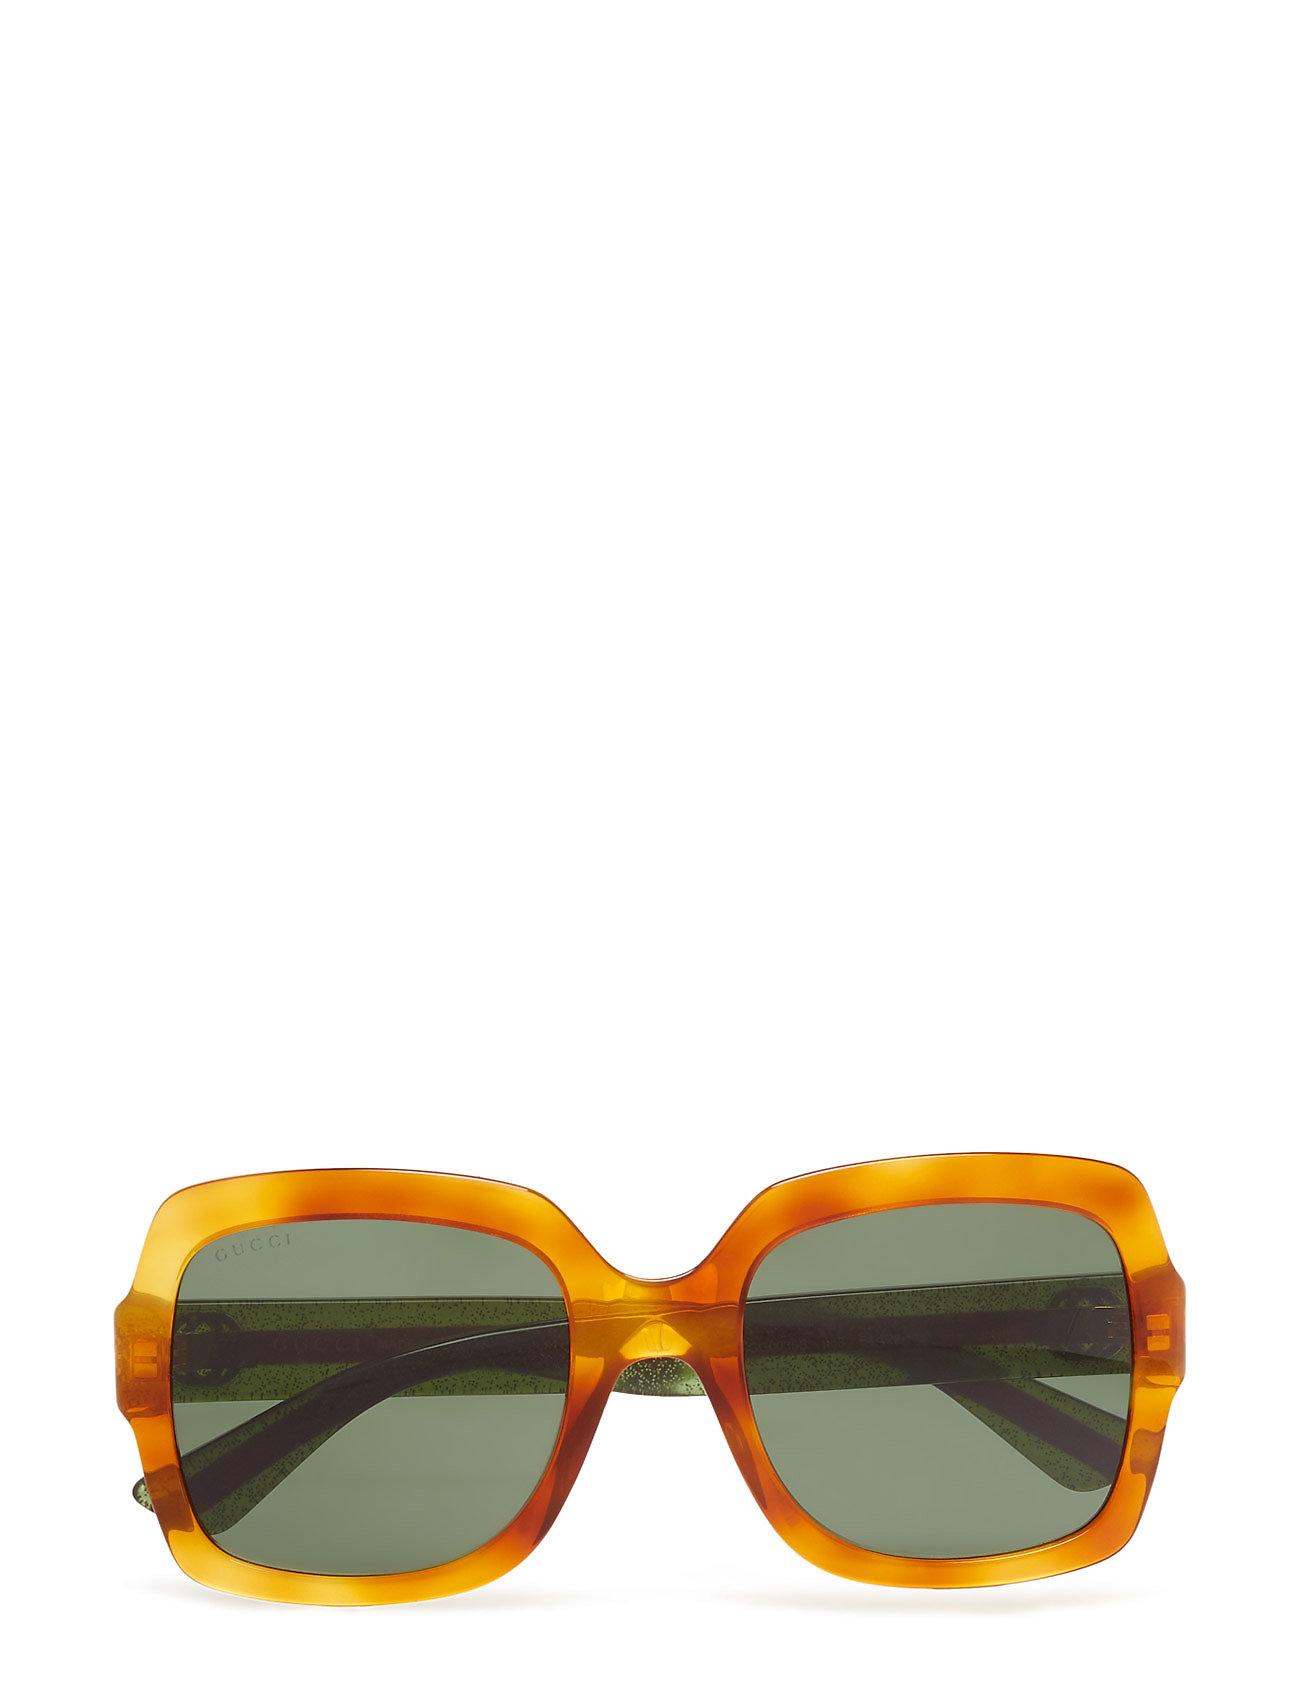 GUCCI Sonnenbrillen   Gg0036s Rechteckige Sonnenbrille Braun GUCCI SUNGLASSES